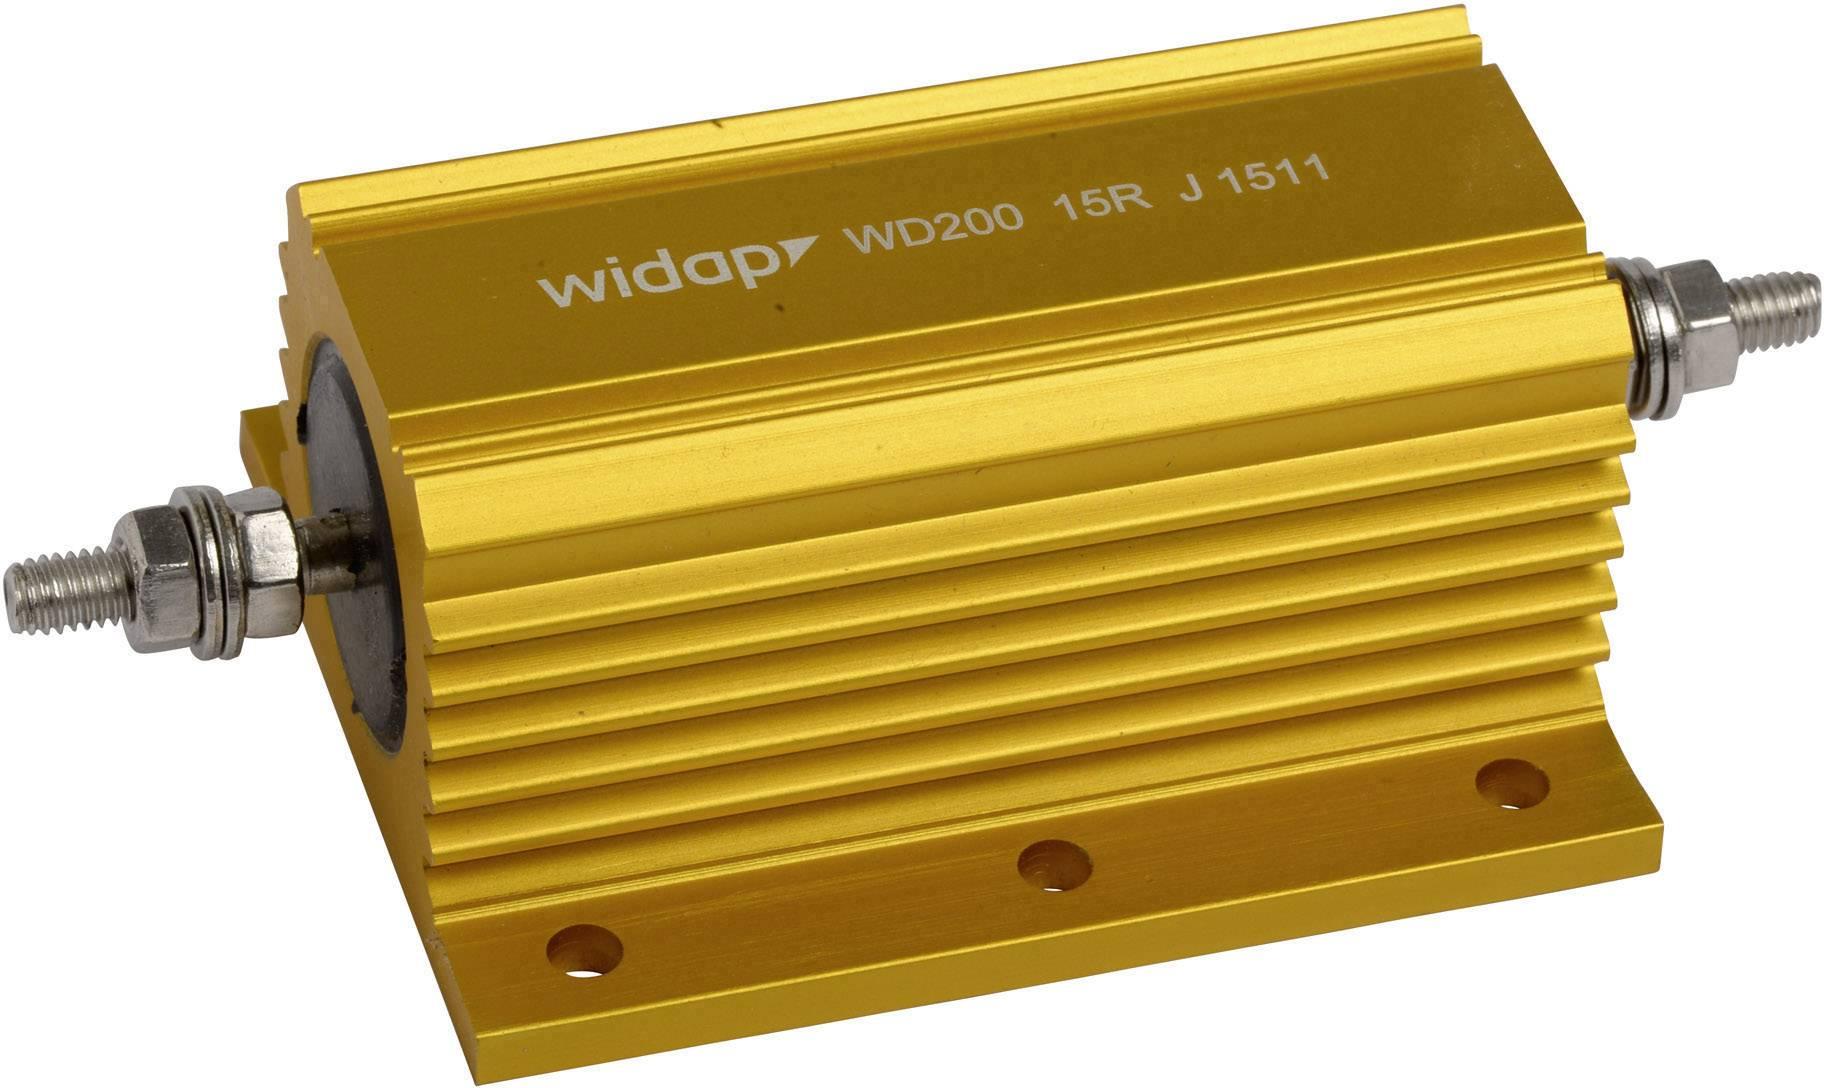 Drôtový rezistor Widap 160159, hodnota odporu 270 Ohm, 200 W, 1 ks